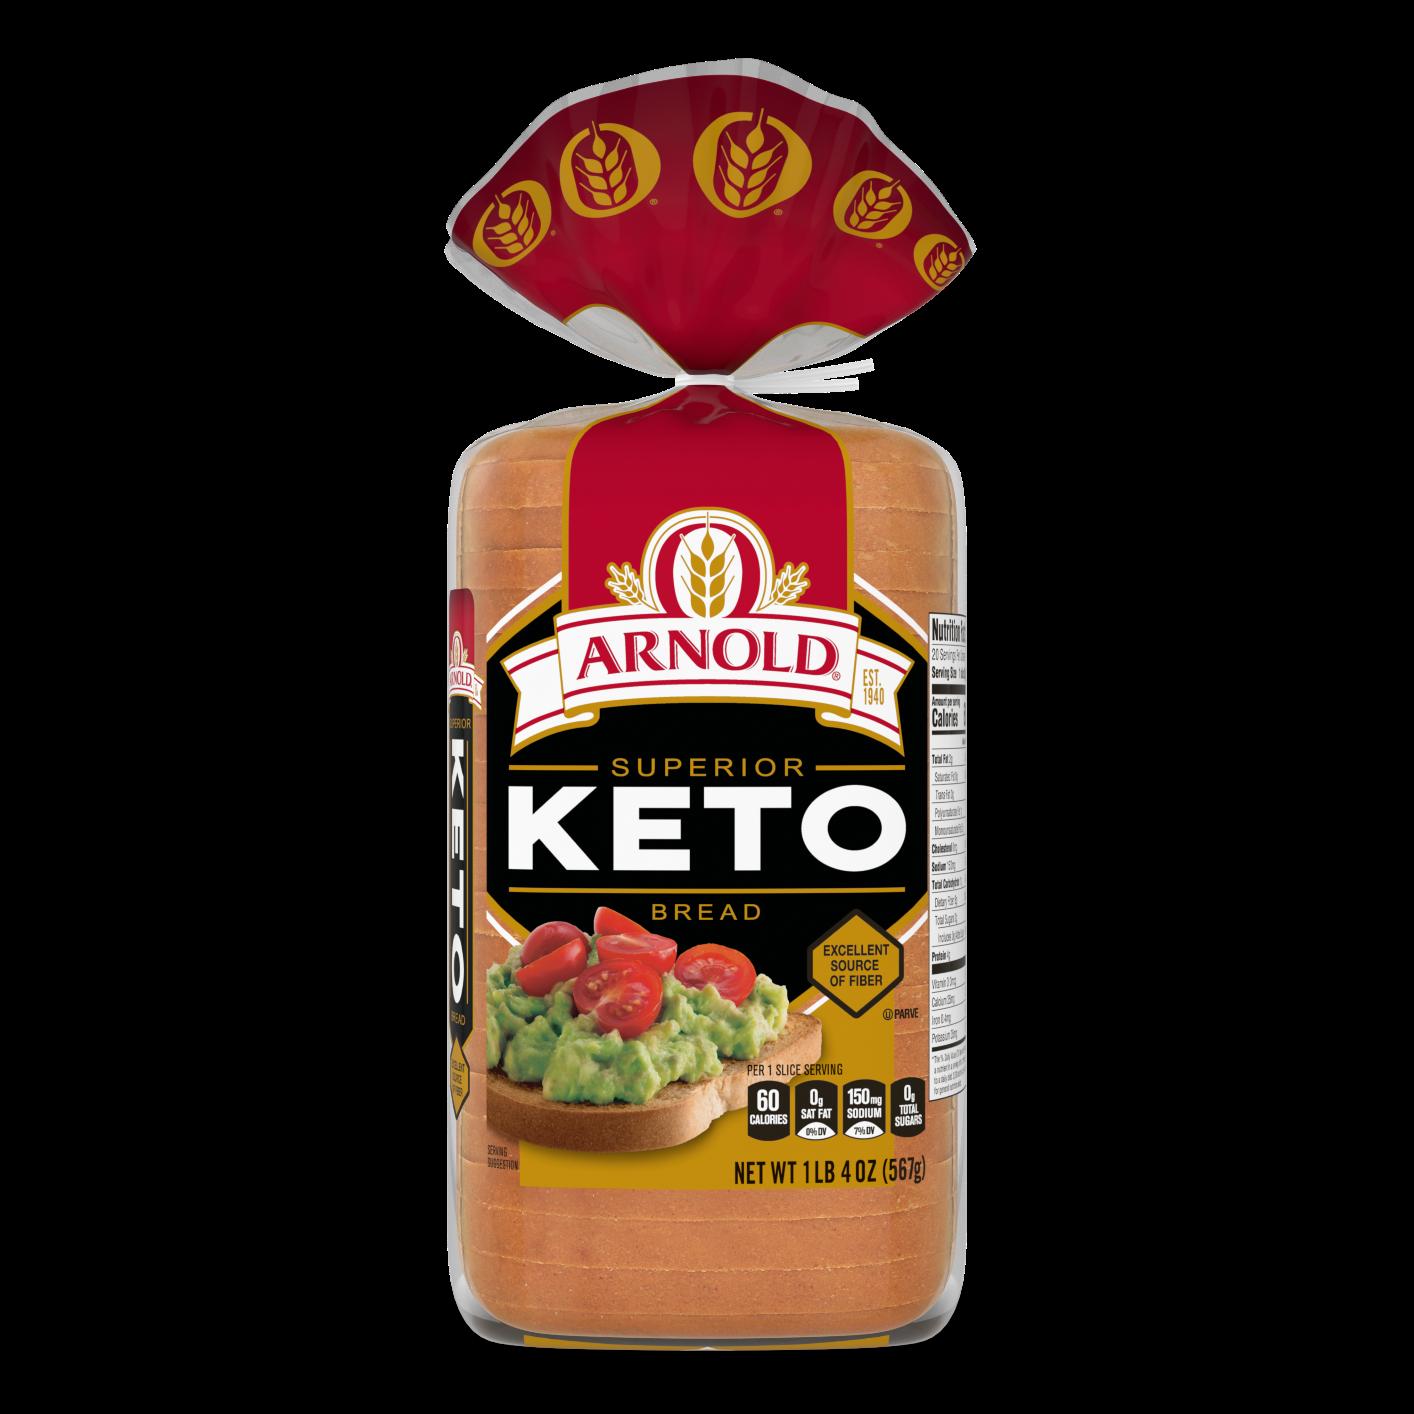 Arnold Keto Bread 20oz Packaging